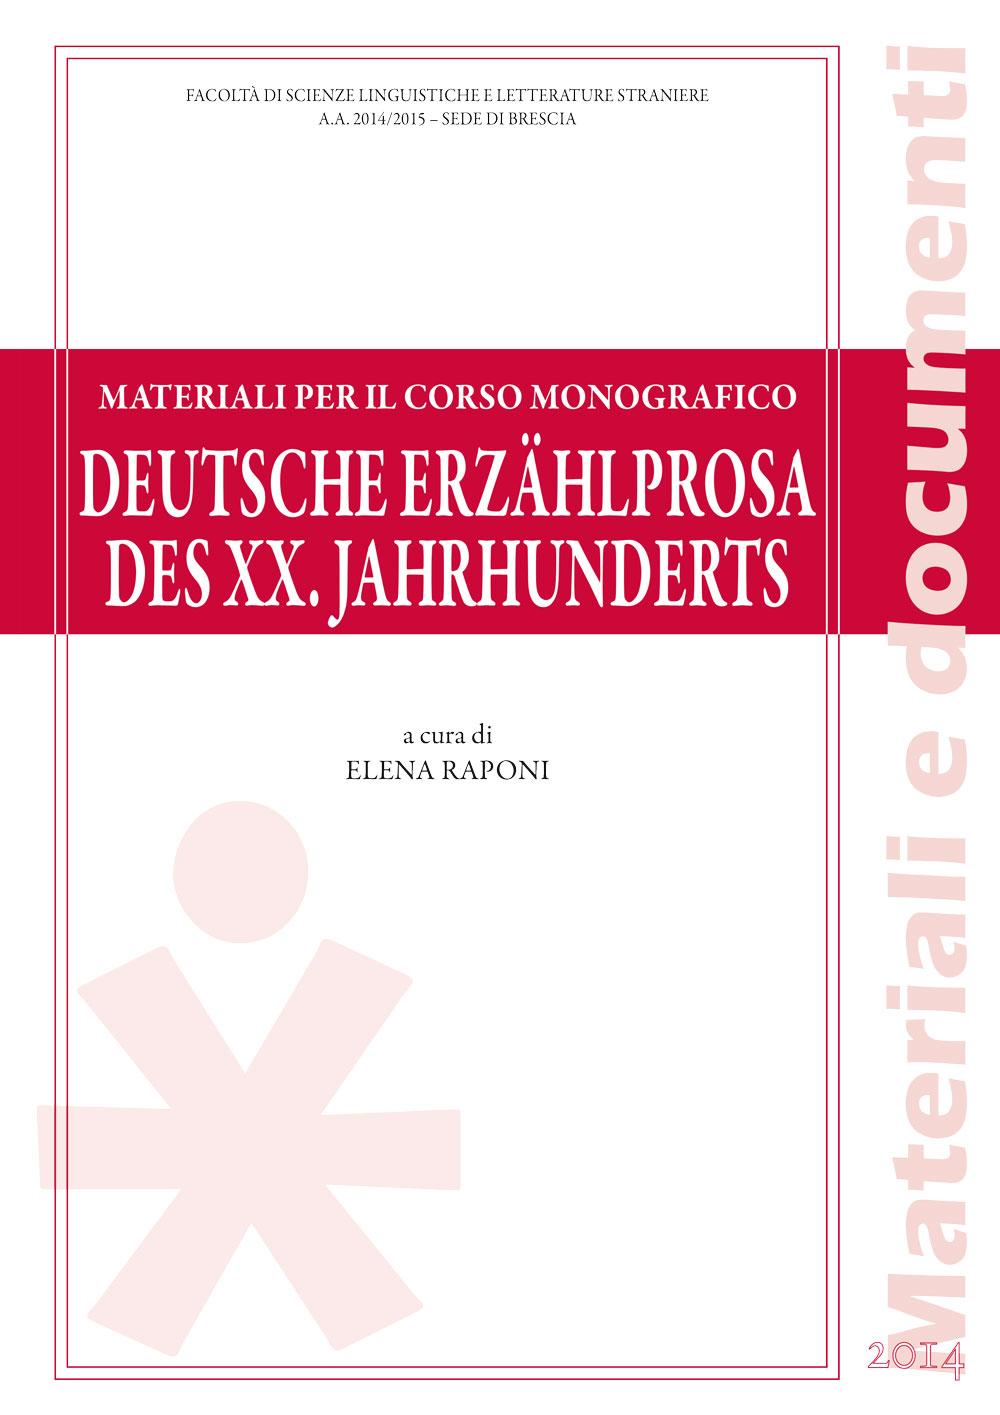 DEUTSCHE ERZAHLPROSA DES XX. JAHRHUNDERTS. MATERIALI PER IL CORSO MONOGRAFICO